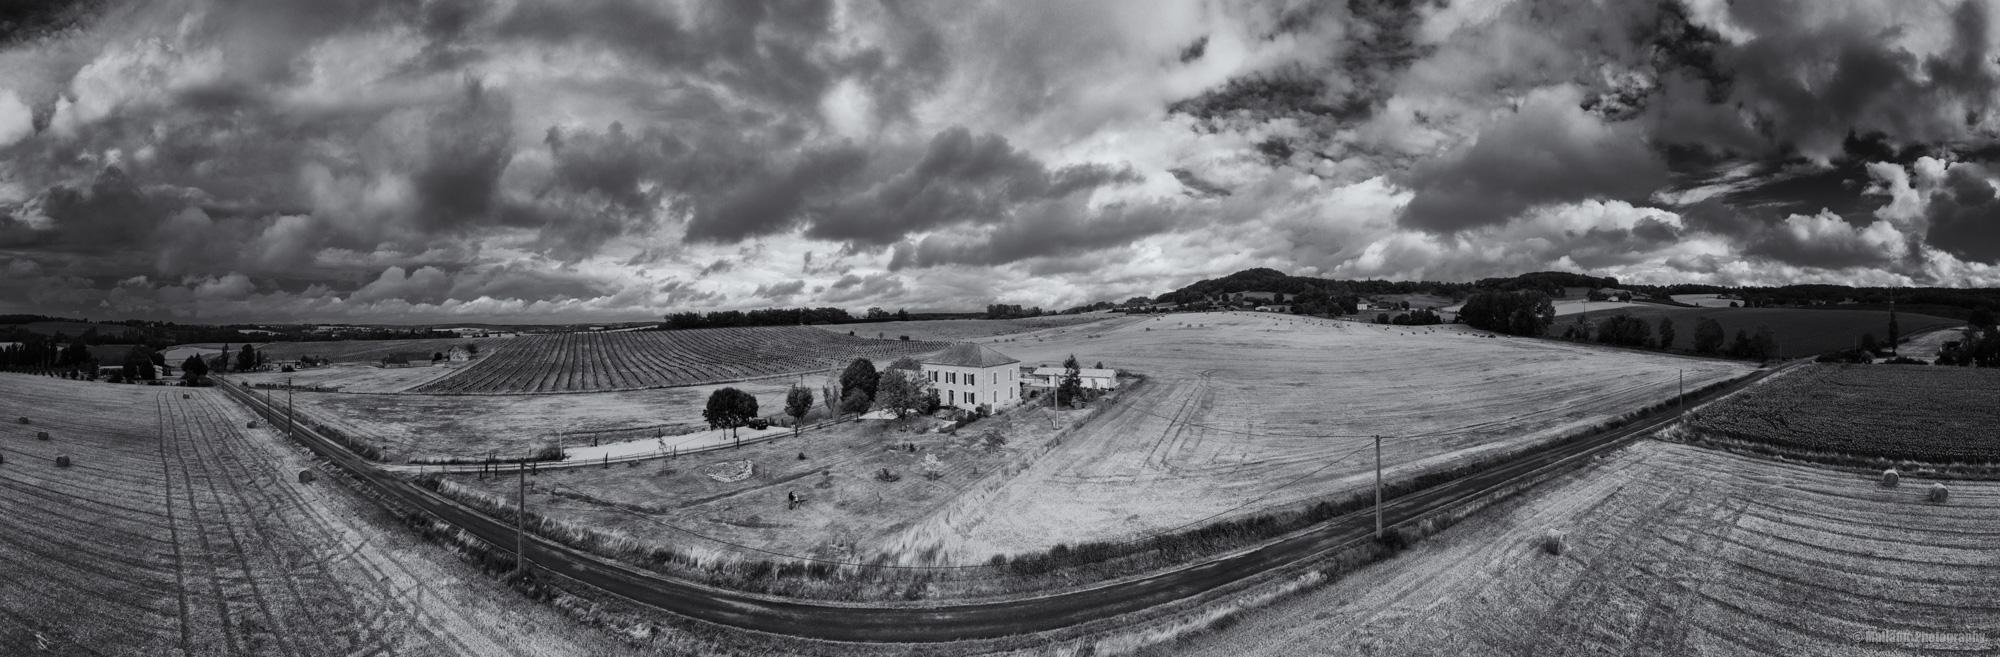 Drohnen Panorama mit Mavic Pro 2 Einstellung 180 Grad Panorama